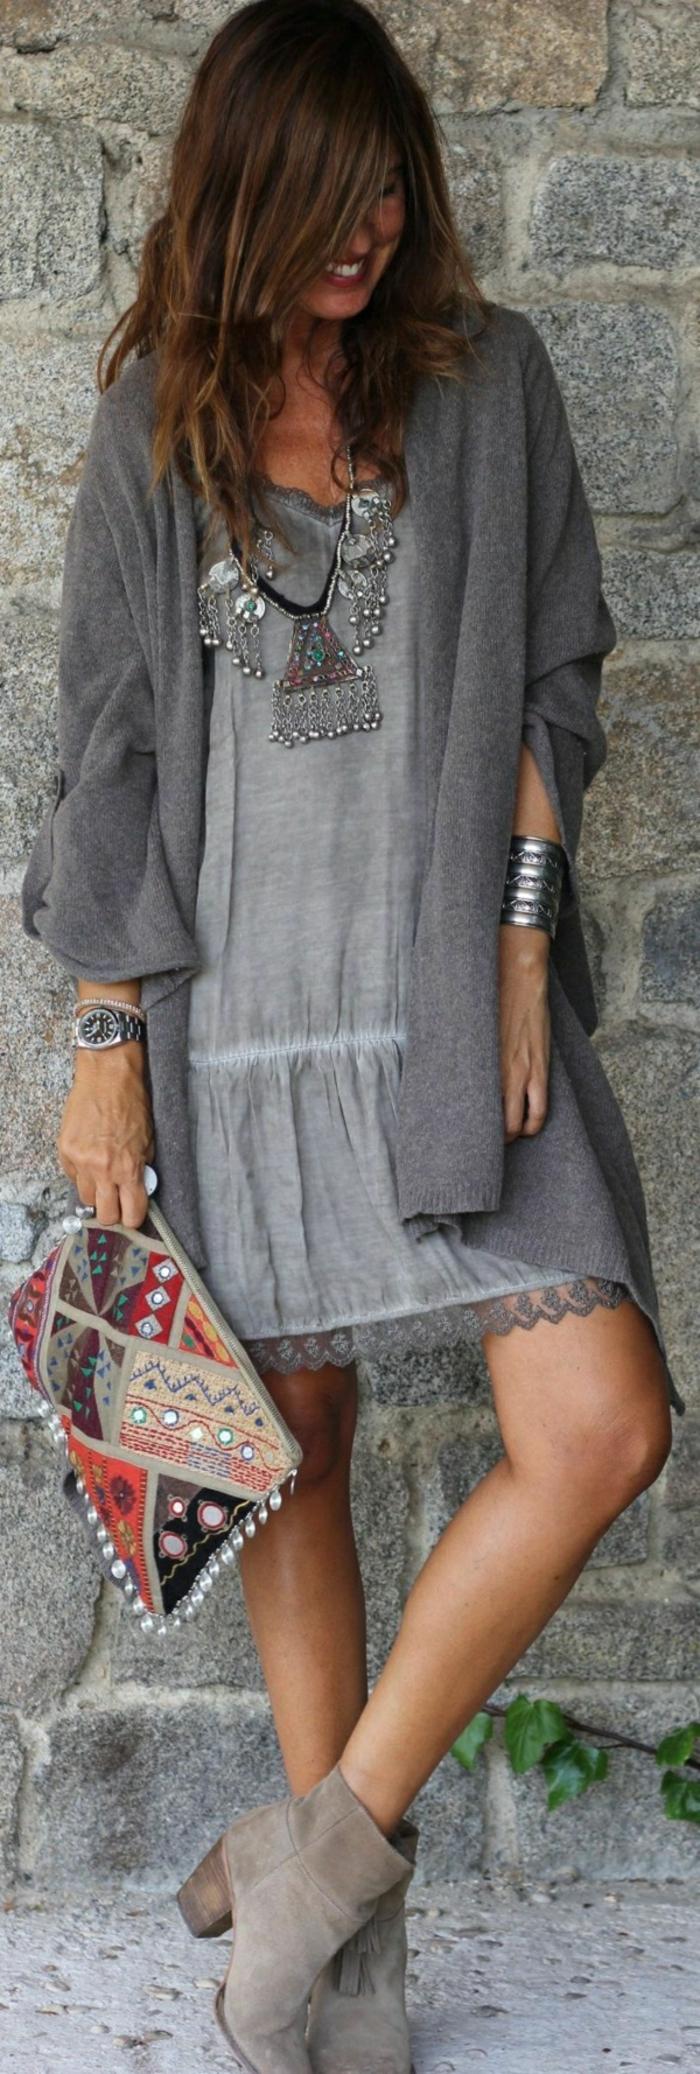 graues-Kleid-Clutch-bohemian-style-silberner-Schmuck